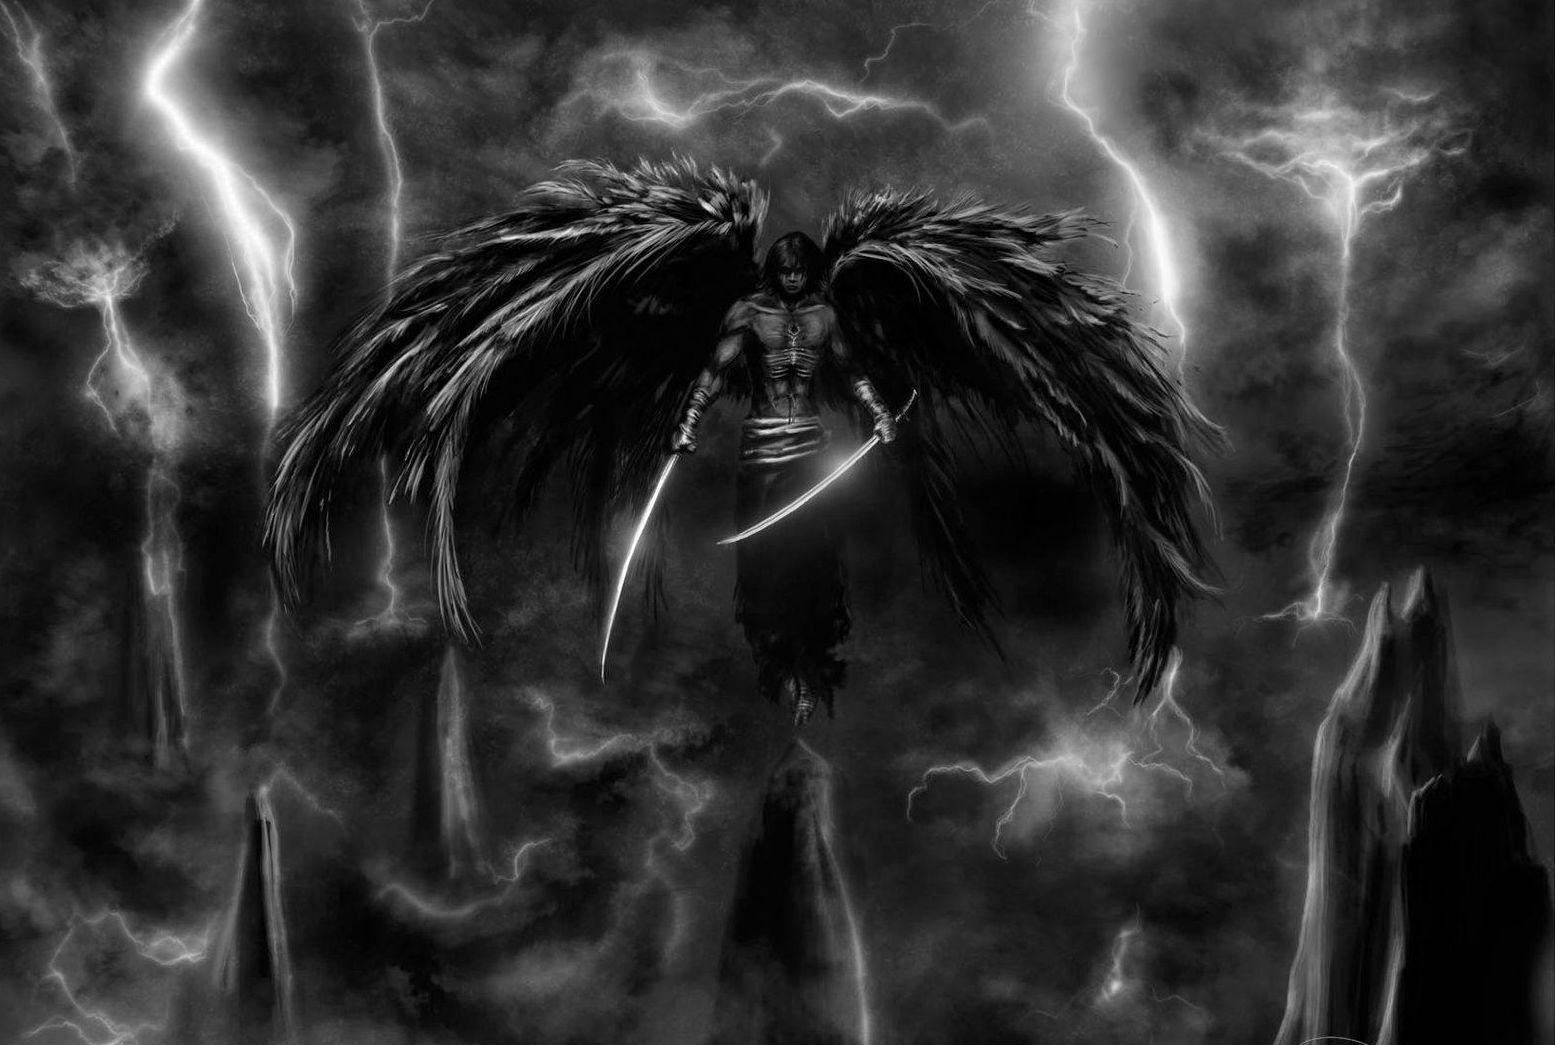 Dark Angel Wallpapers Top Free Dark Angel Backgrounds